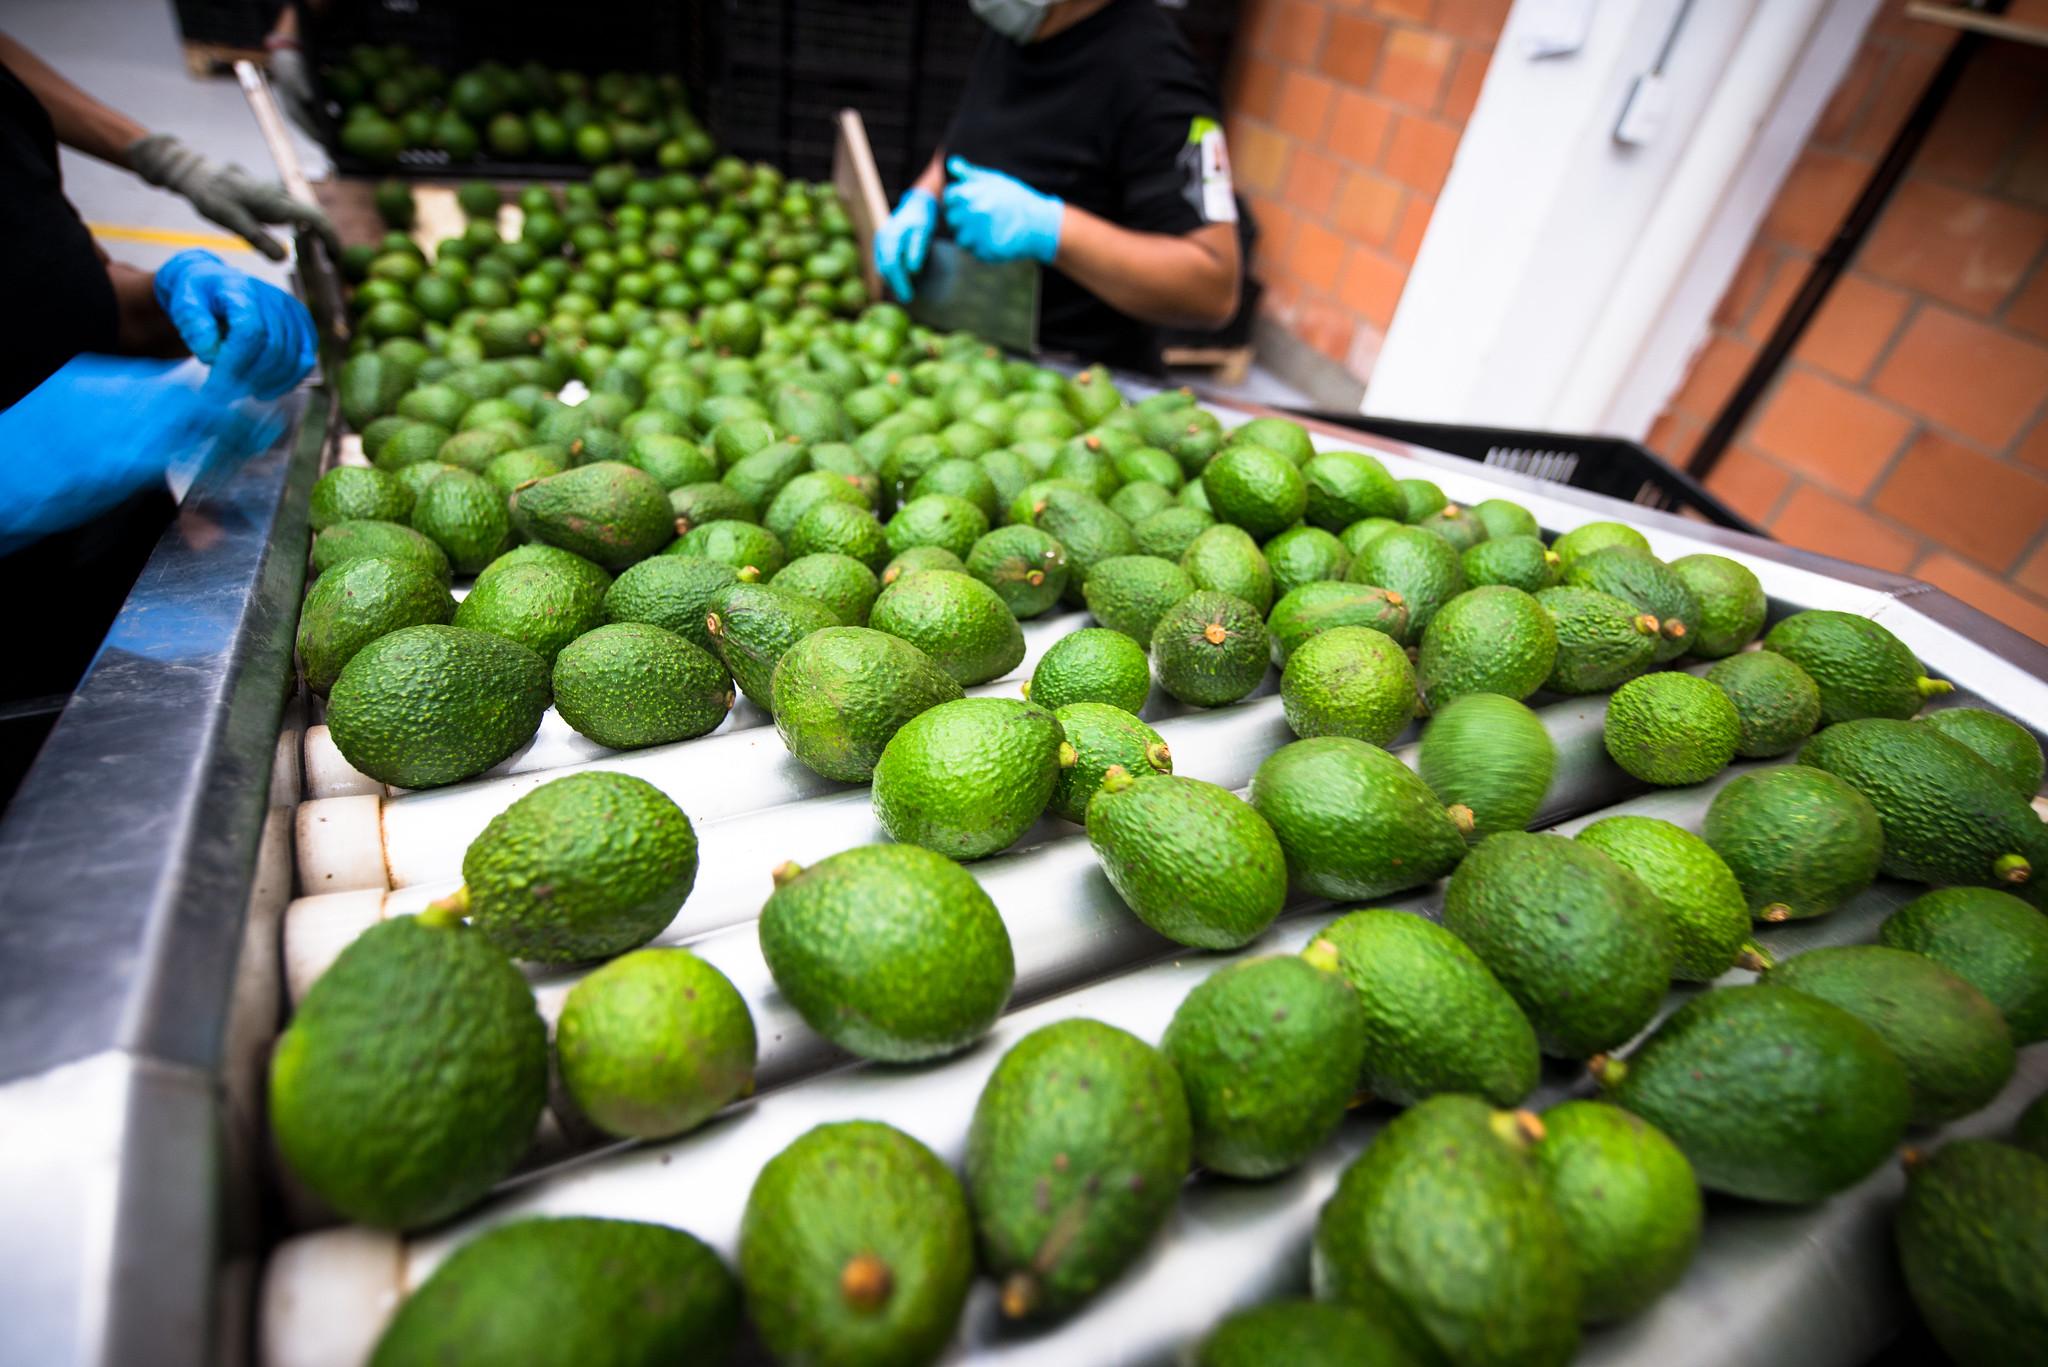 South Korea gives green light to imports of Colombian avocado